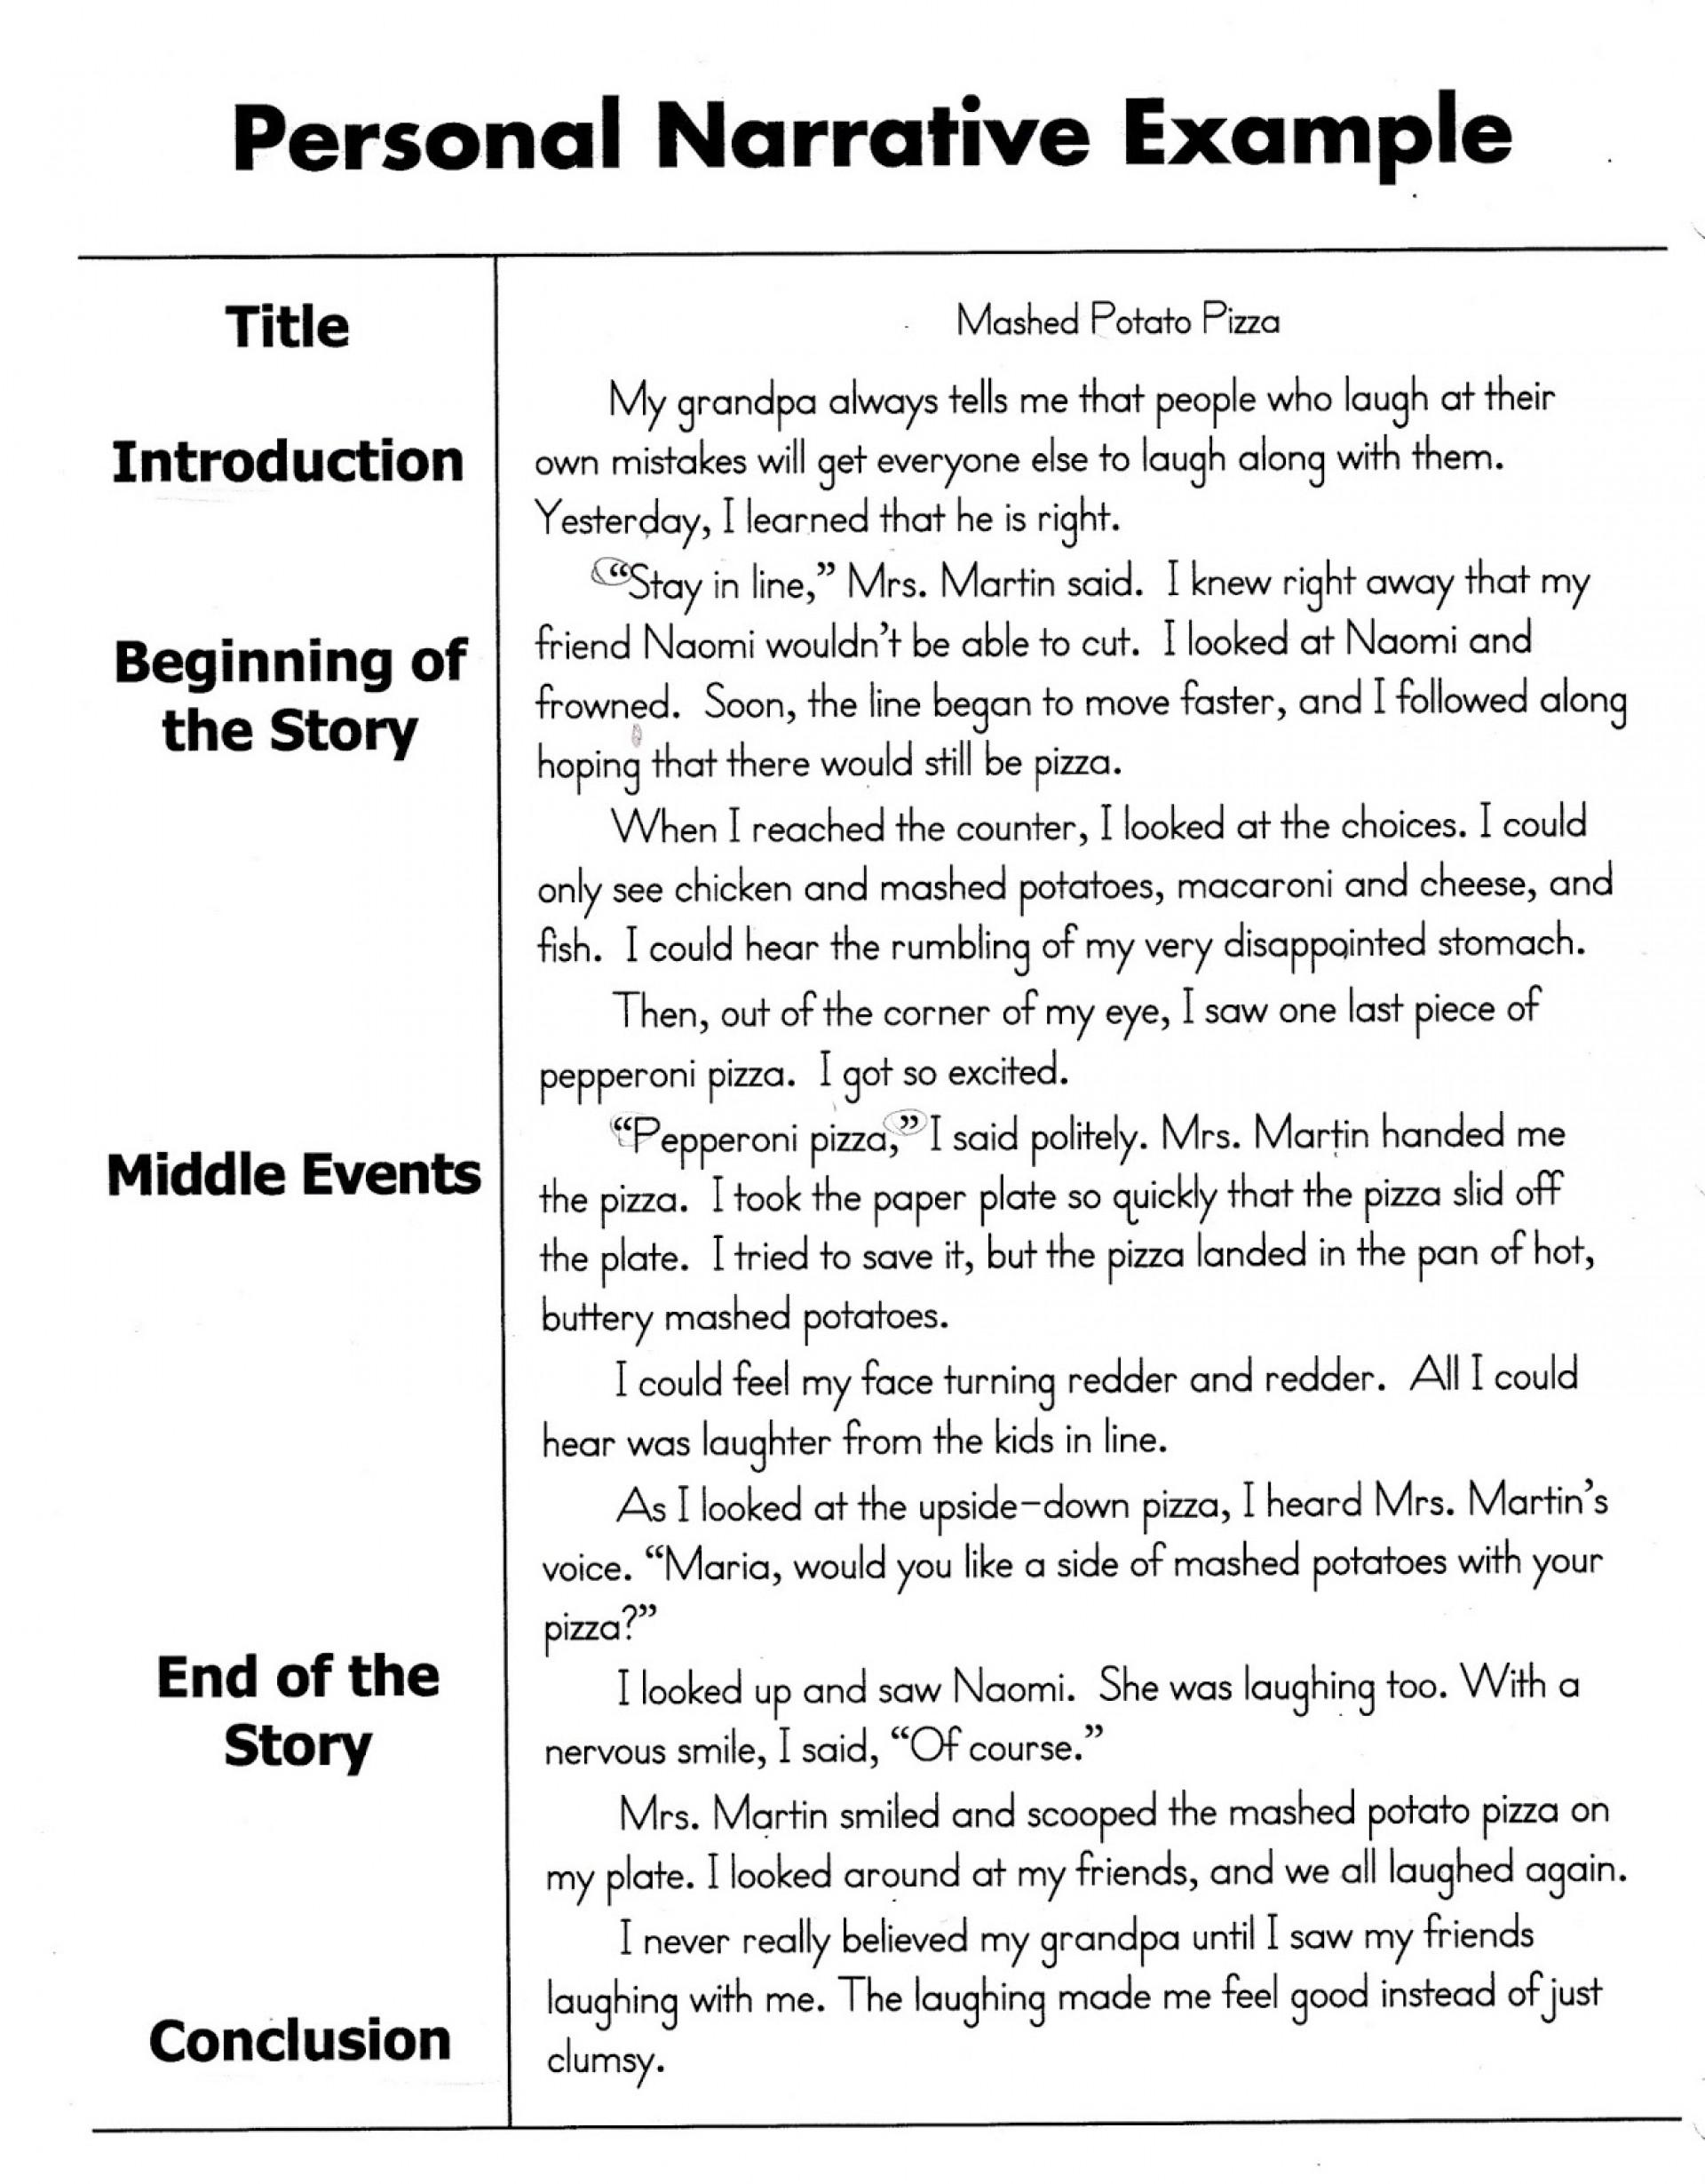 020 8th Grade Essay Topics Example Phenomenal Narrative Us History Questions 1920